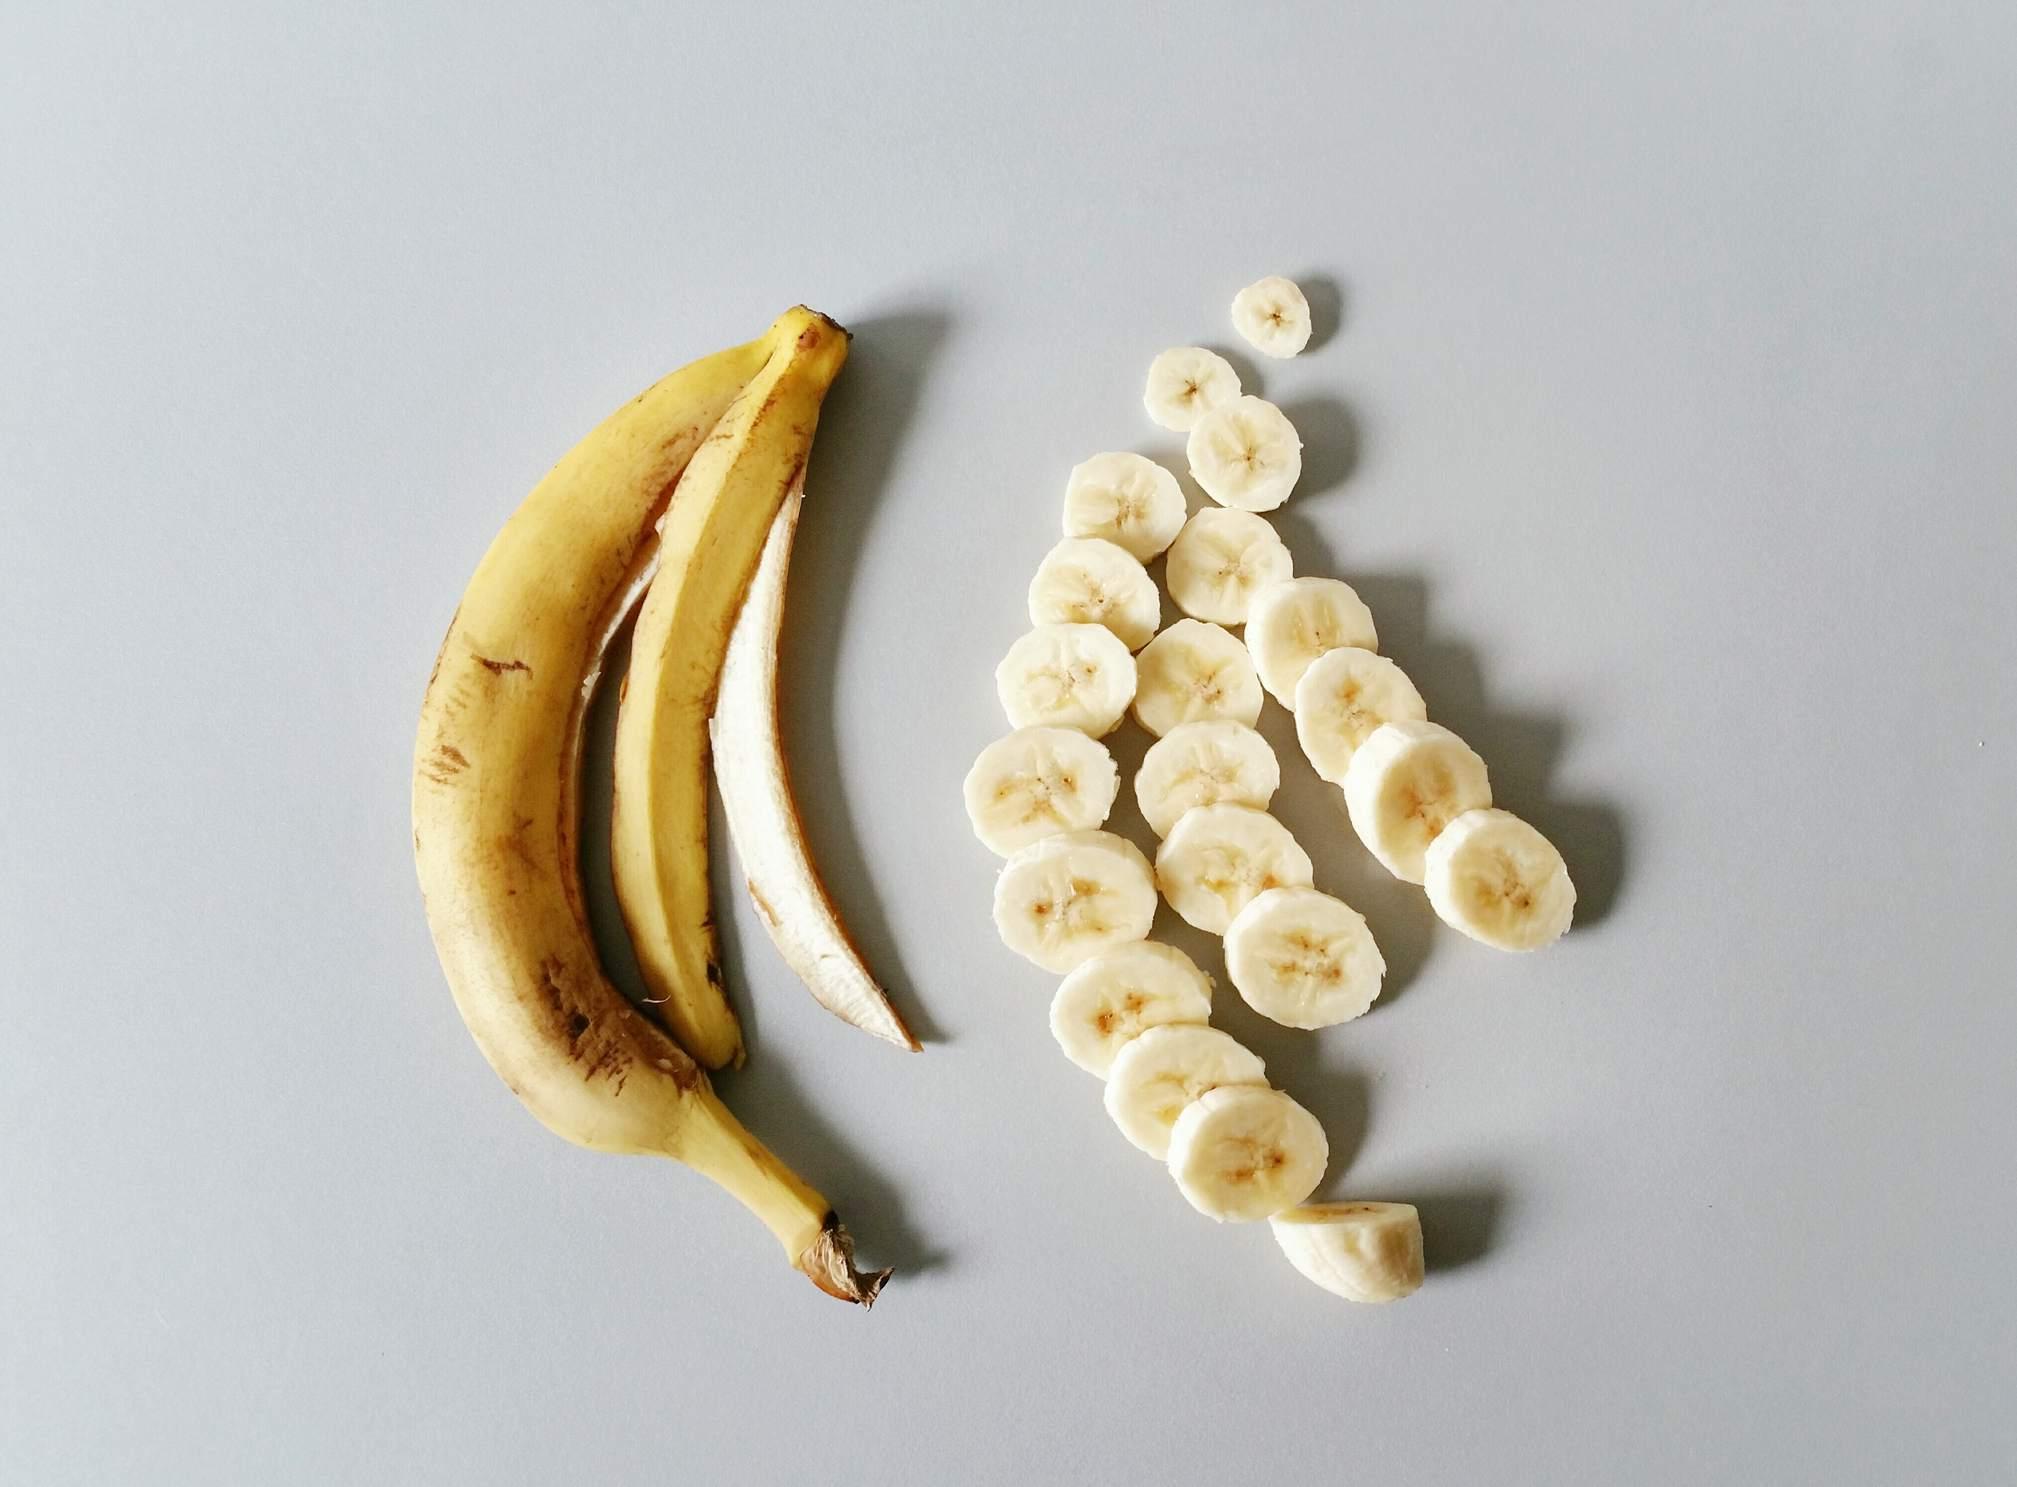 A banana peel laying next to sliced banana